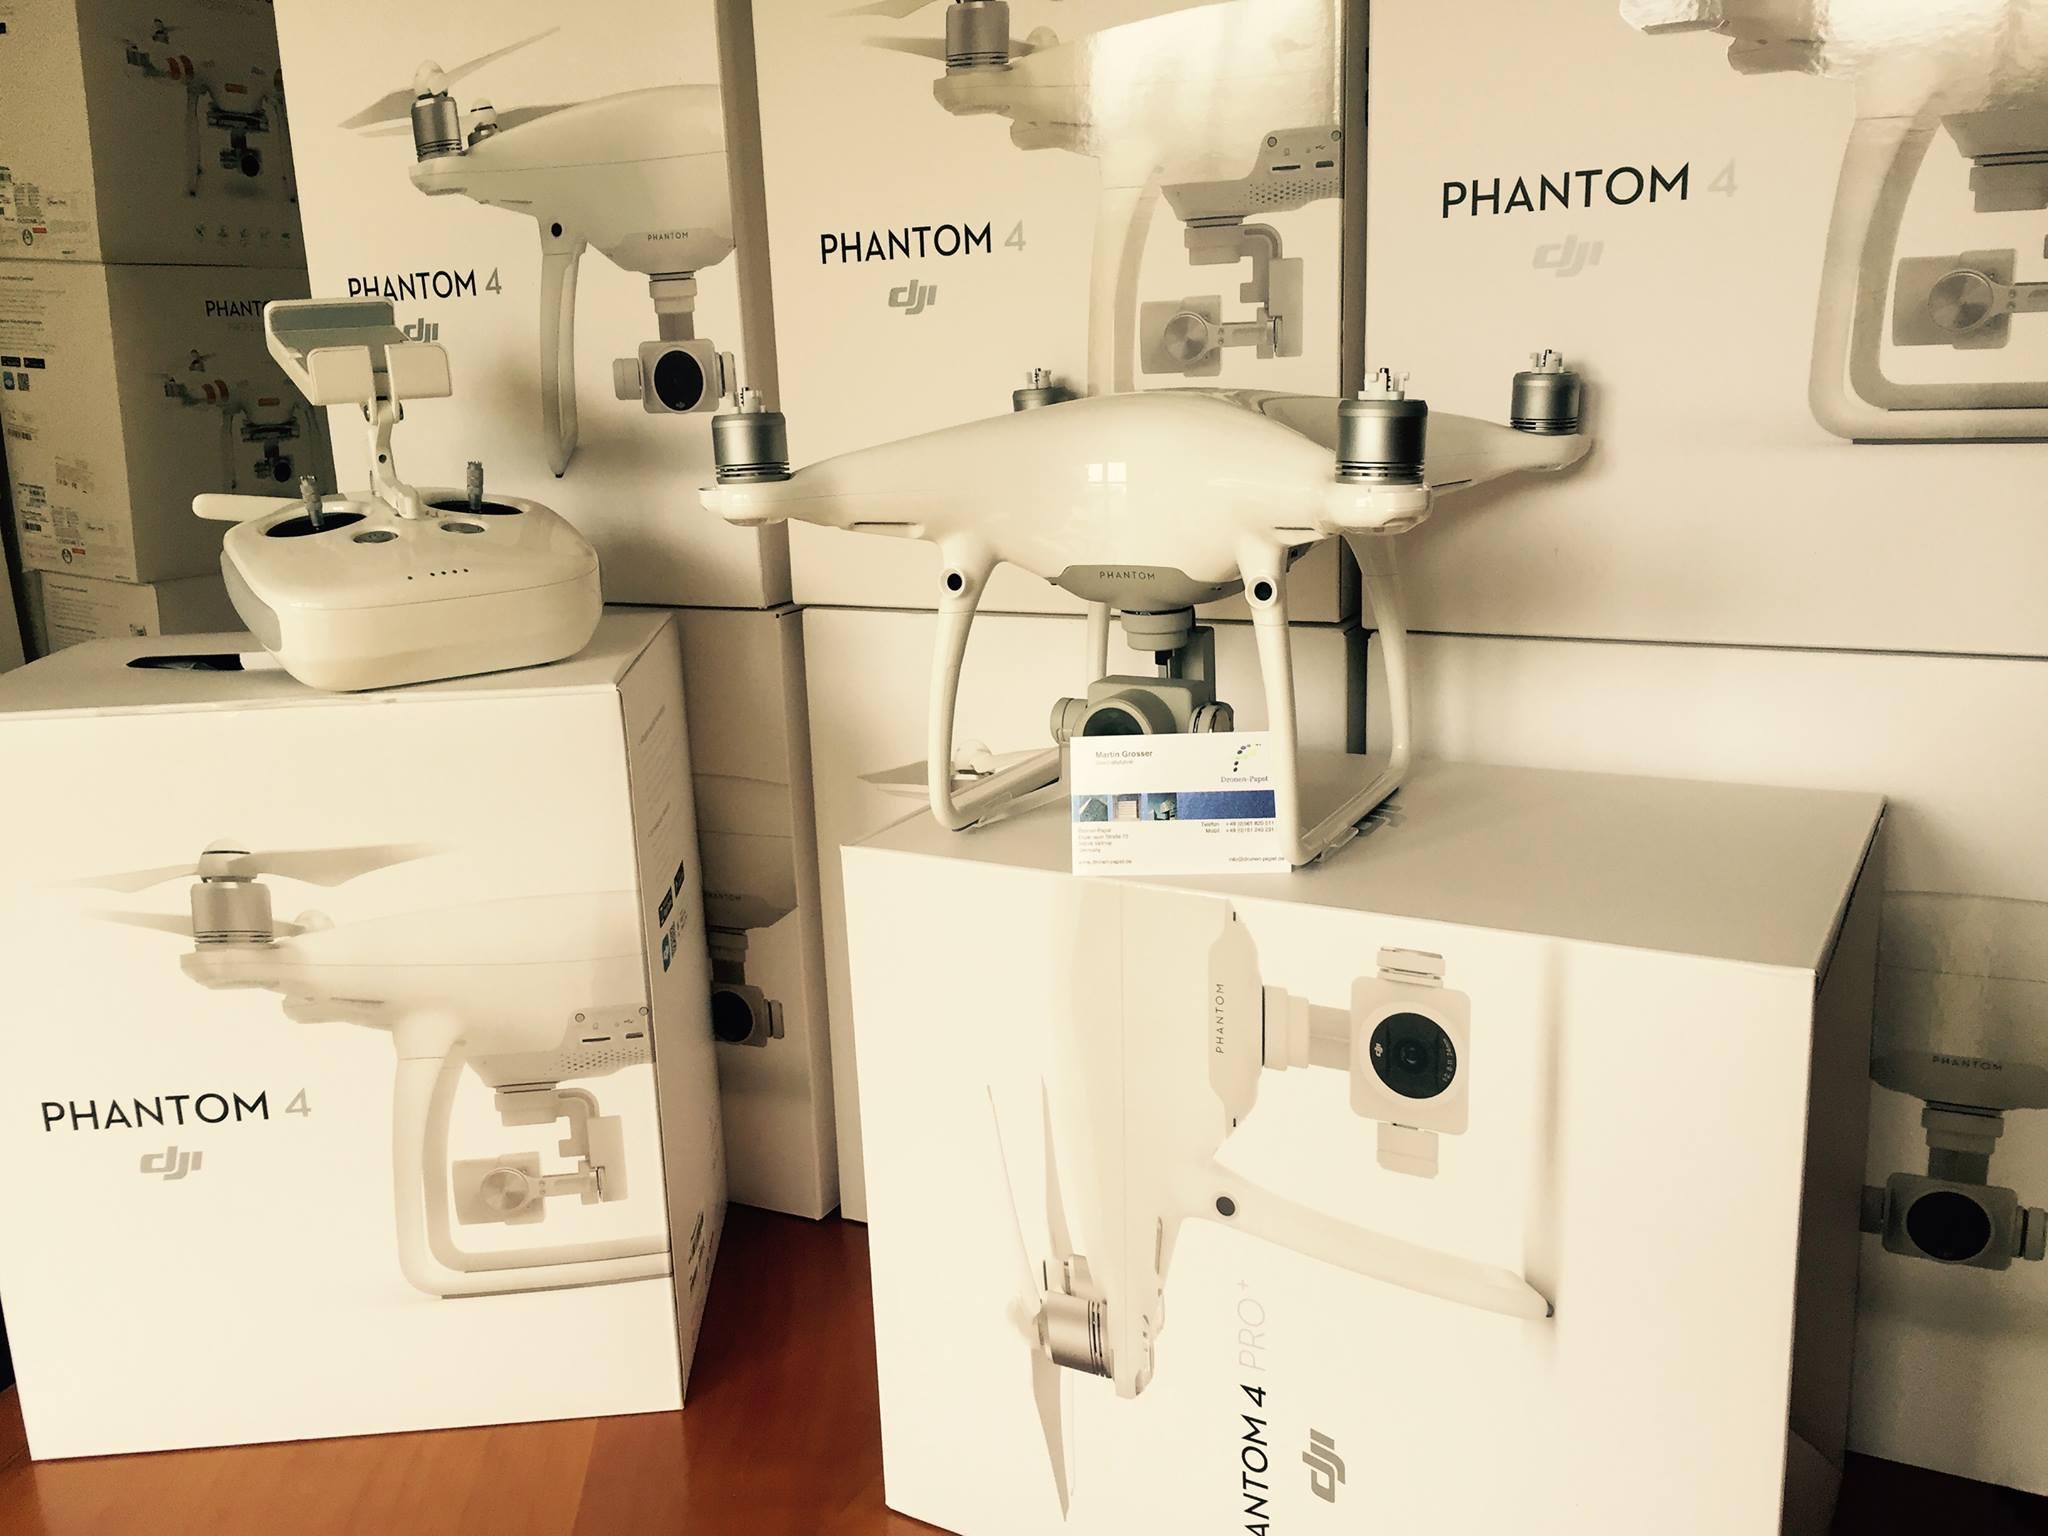 DJI Phantom 4 Pro Lieferung